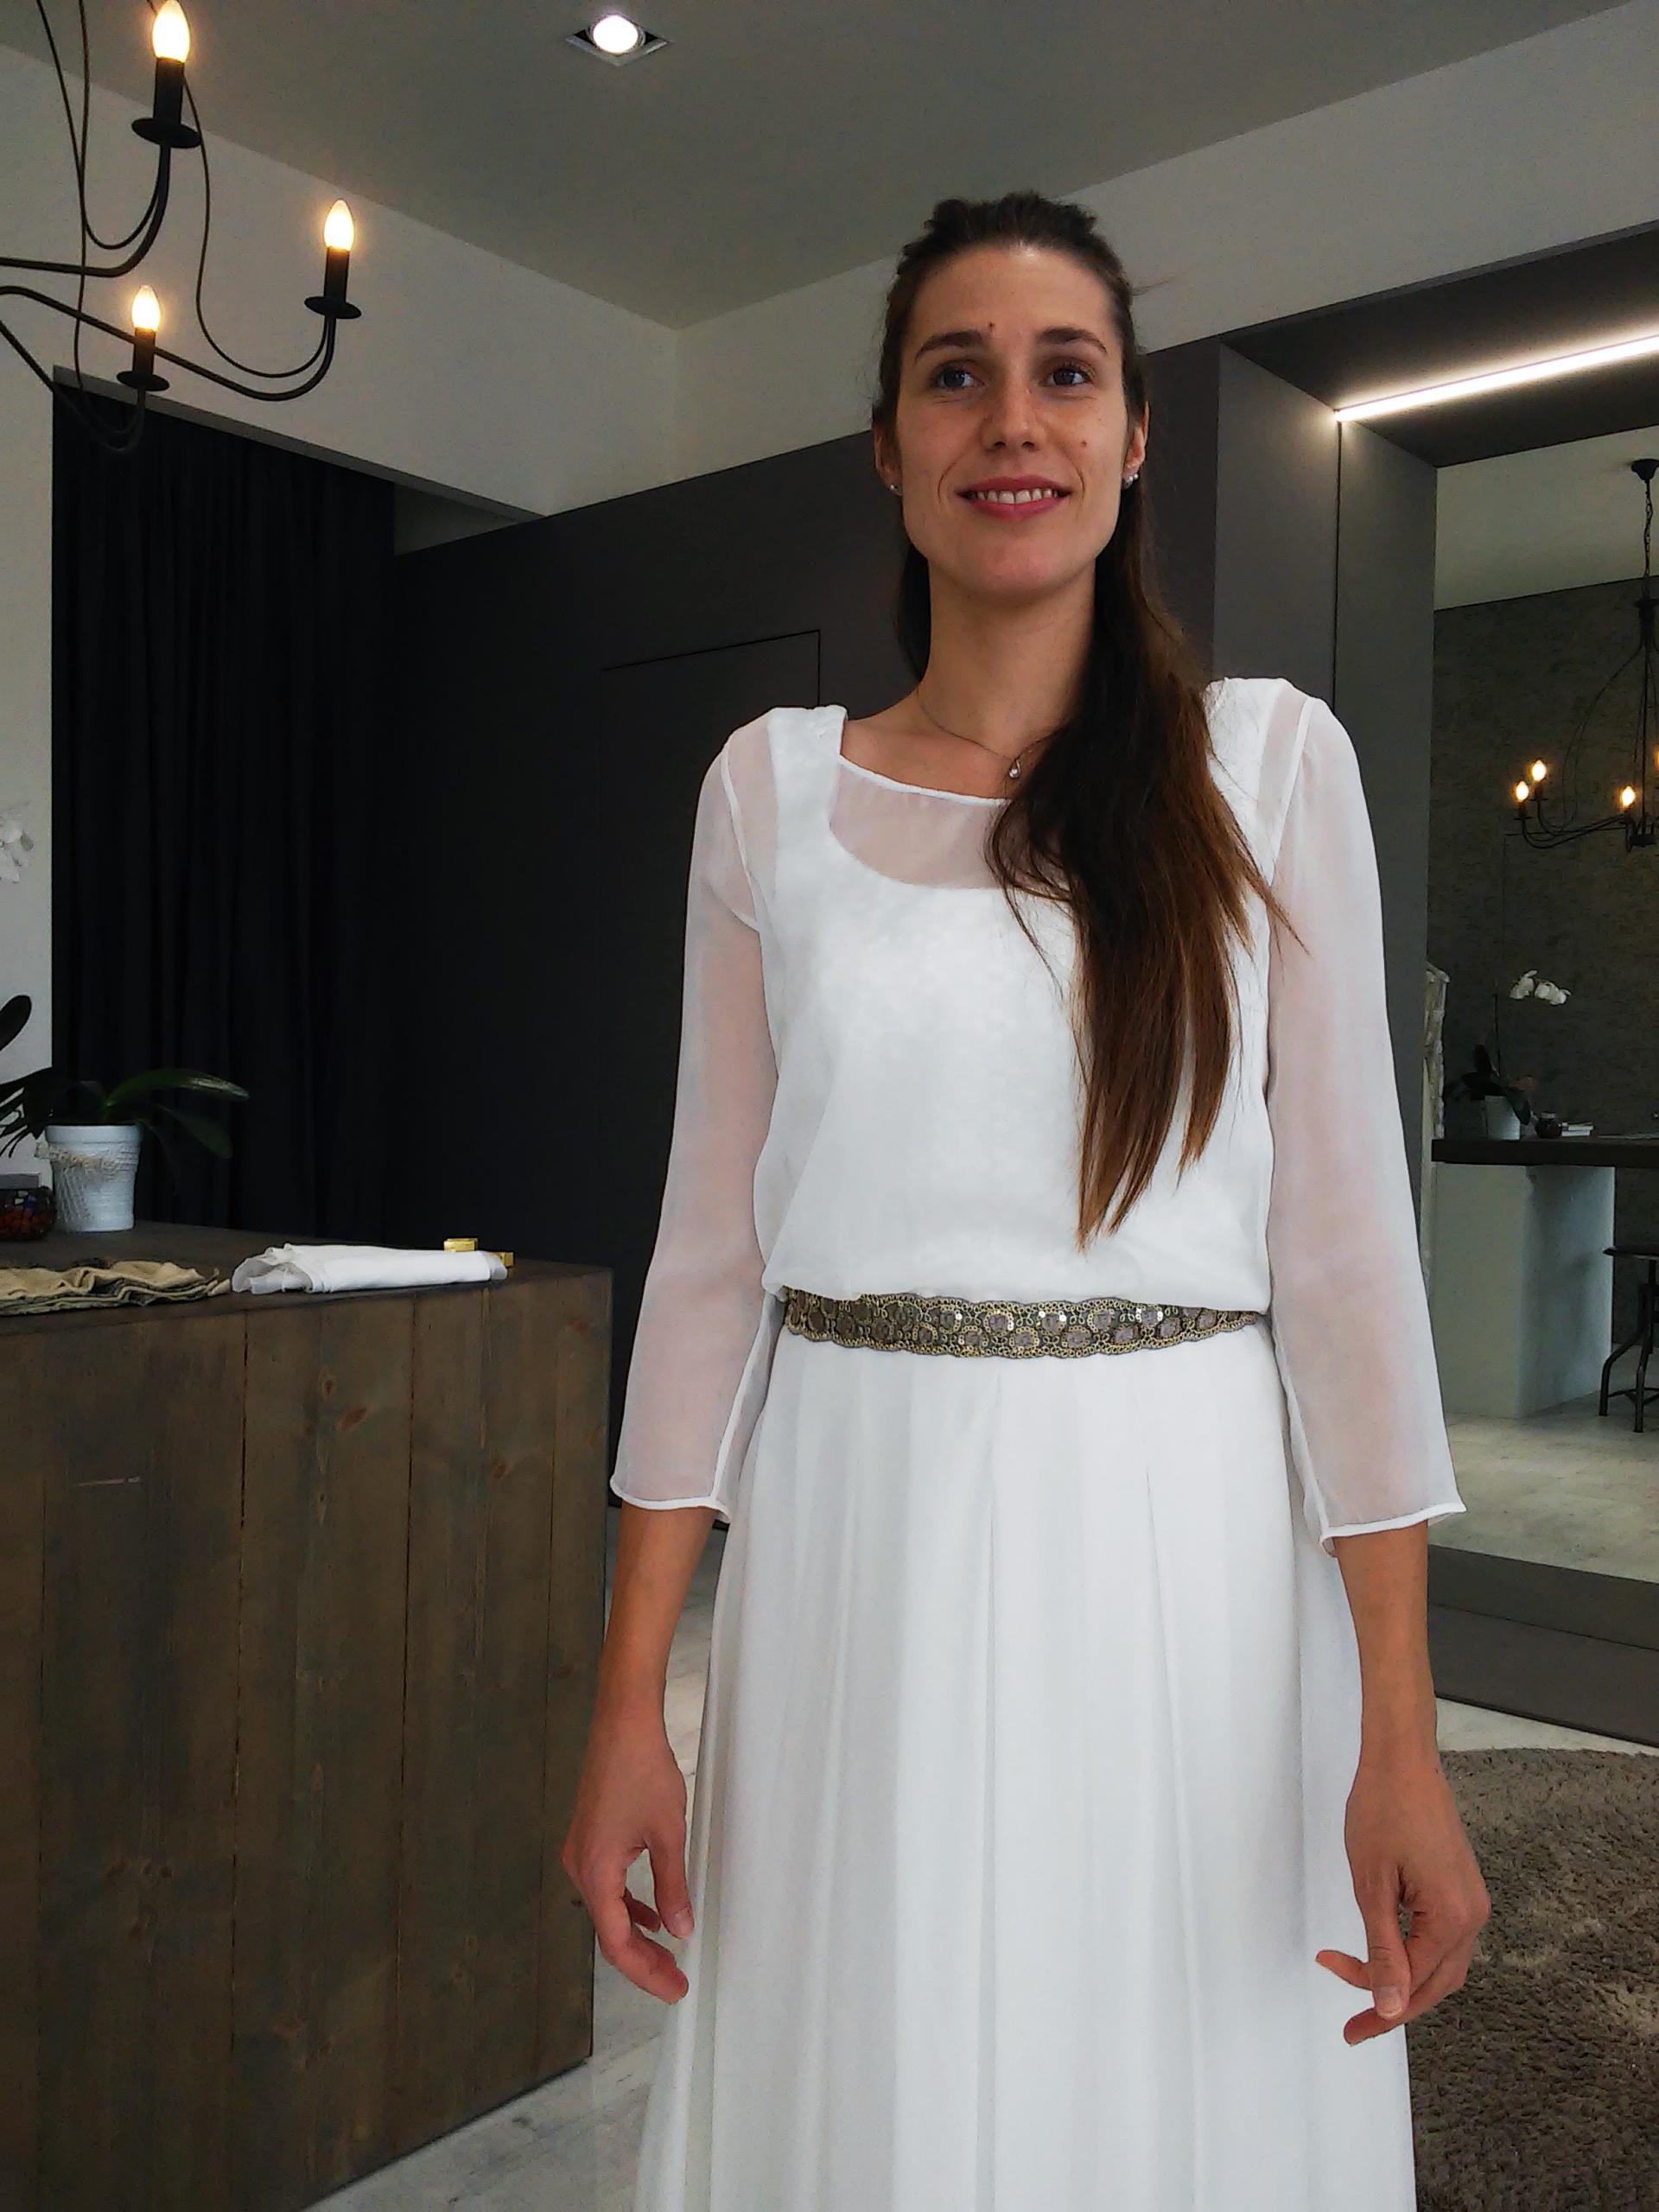 Mariachiara Rossi